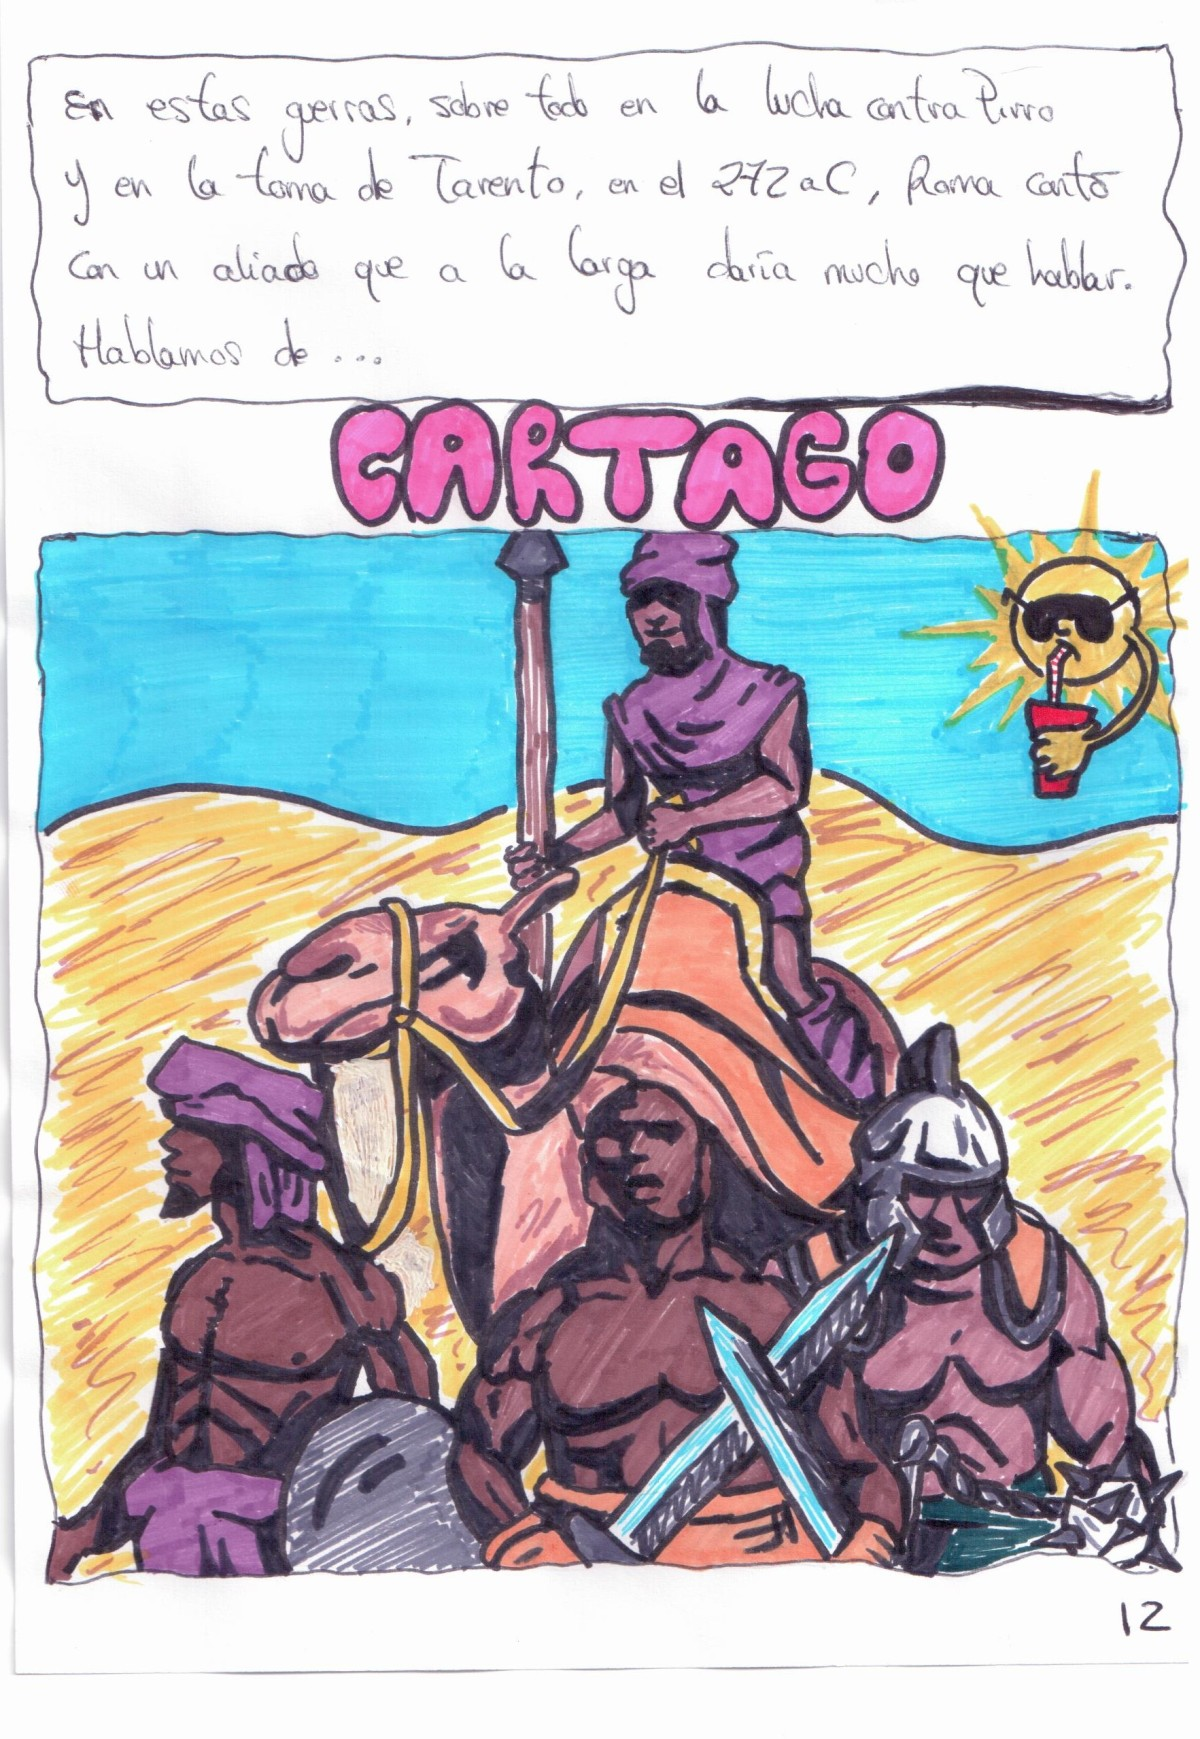 sarro-12-001